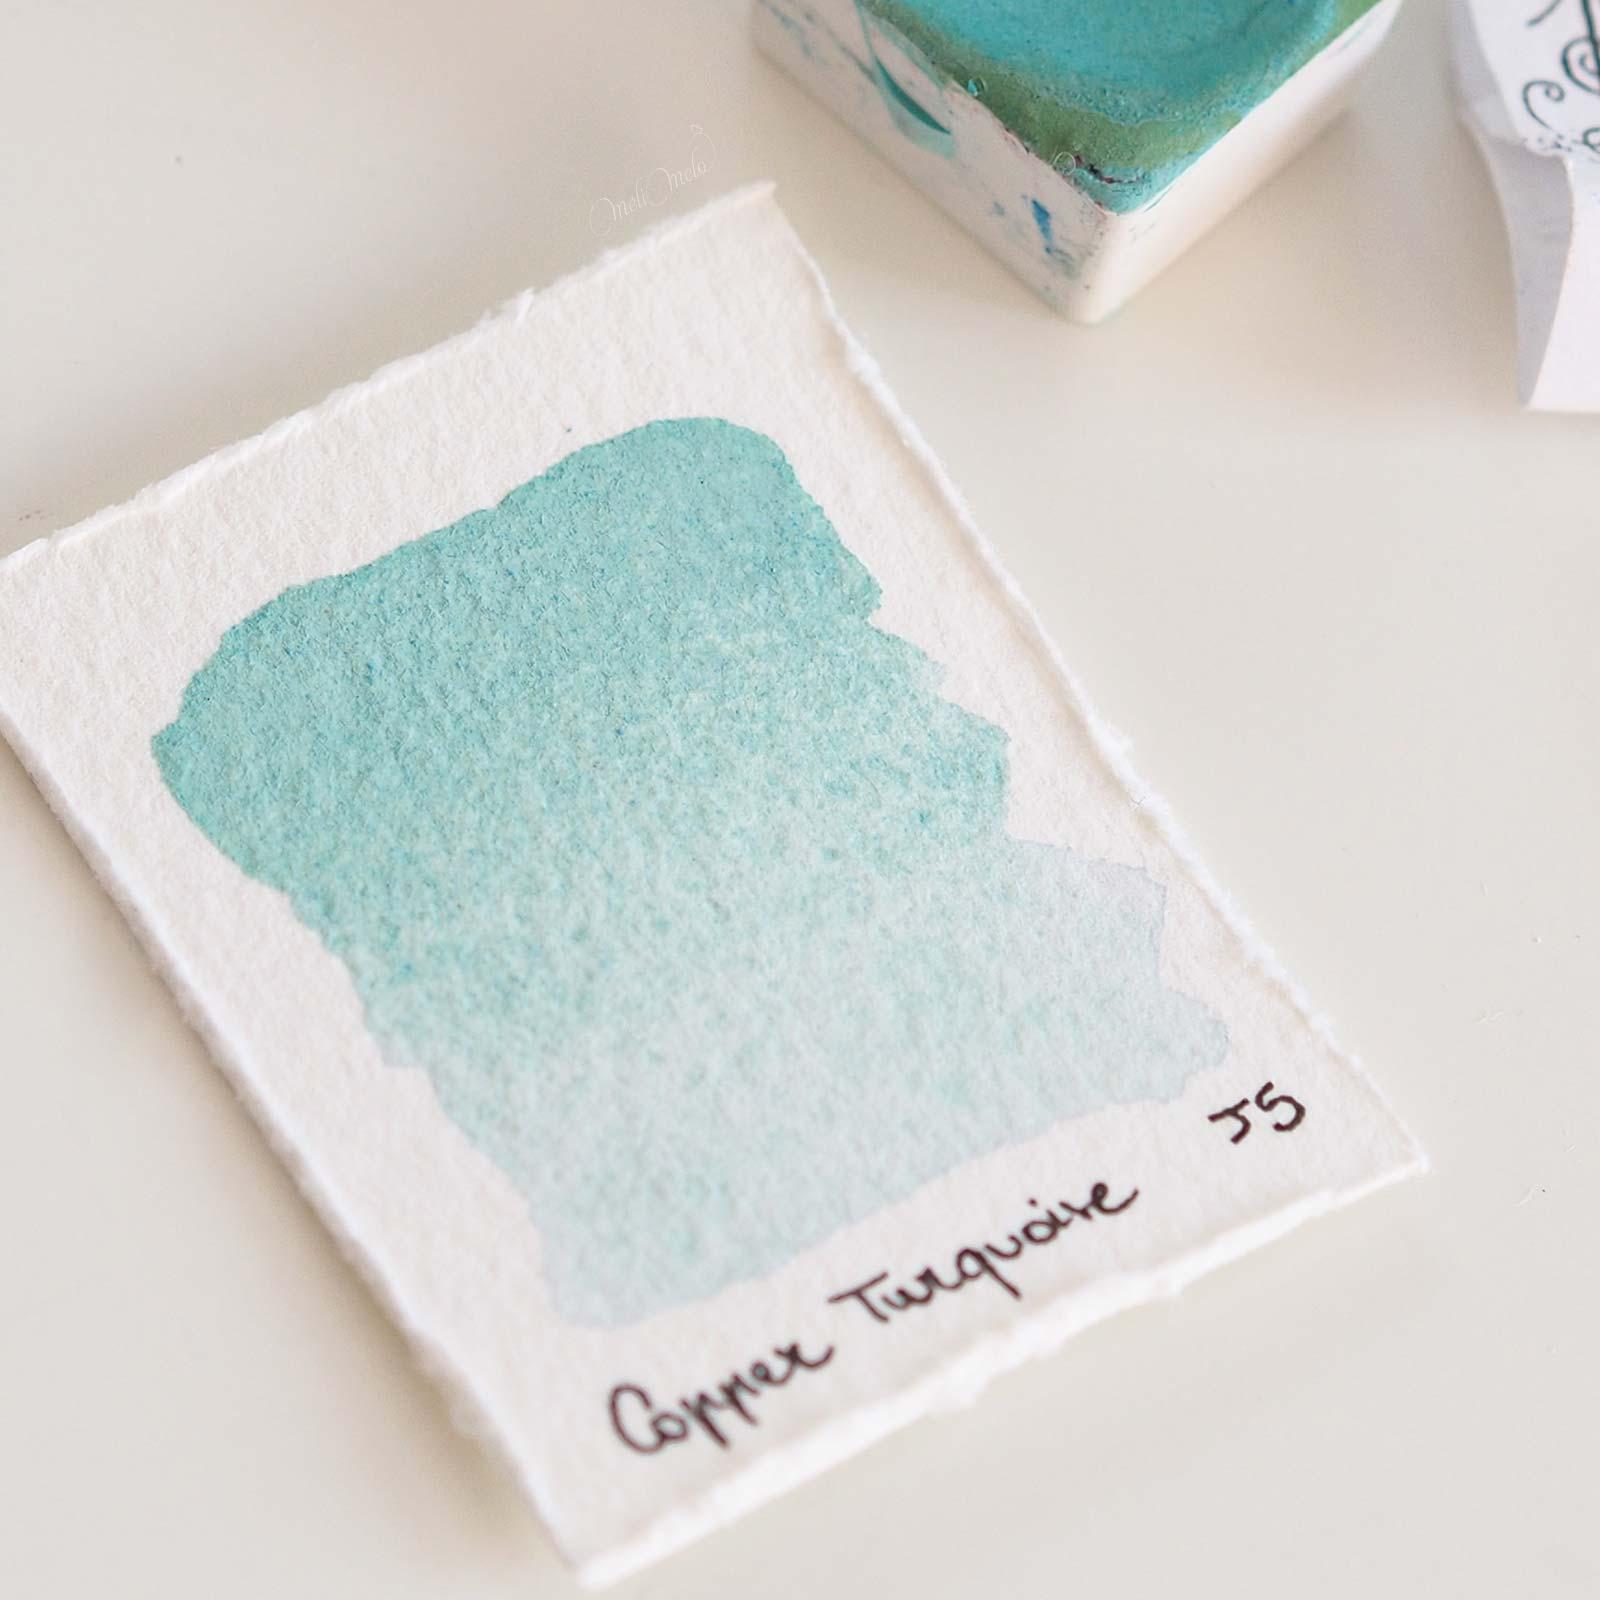 watercolor-jazper-stardust-aquarelle-copper-turquoise-laboutiquedemelimelo